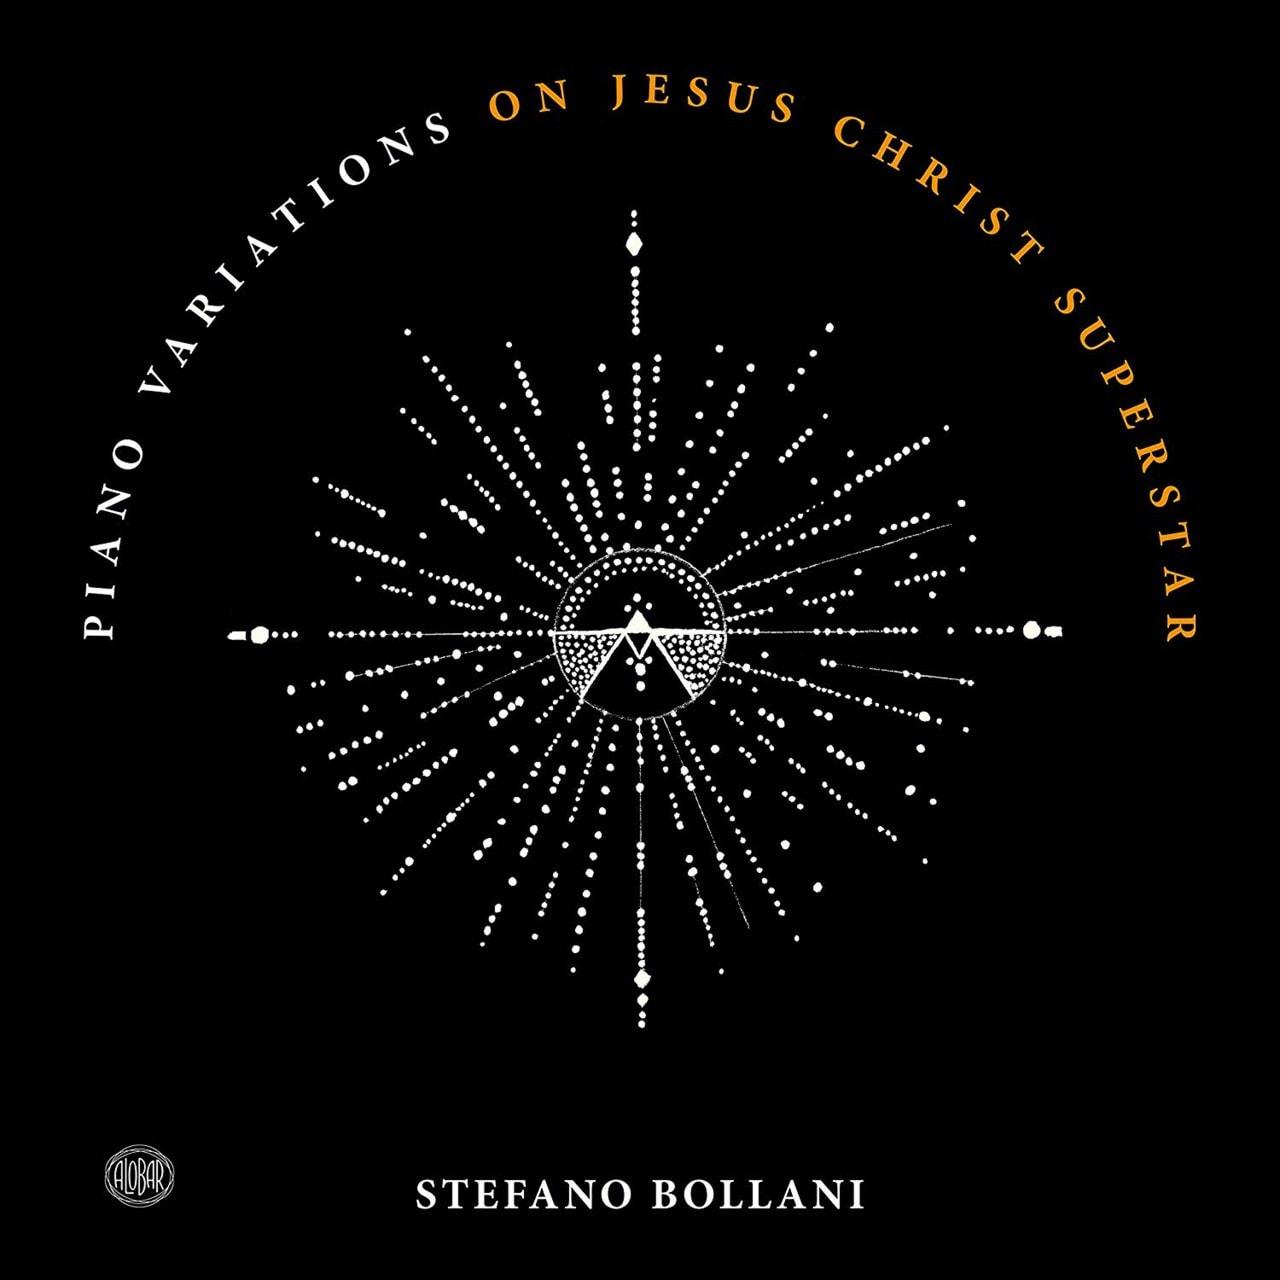 Piano Variations On Jesus Christ Superstar - 1